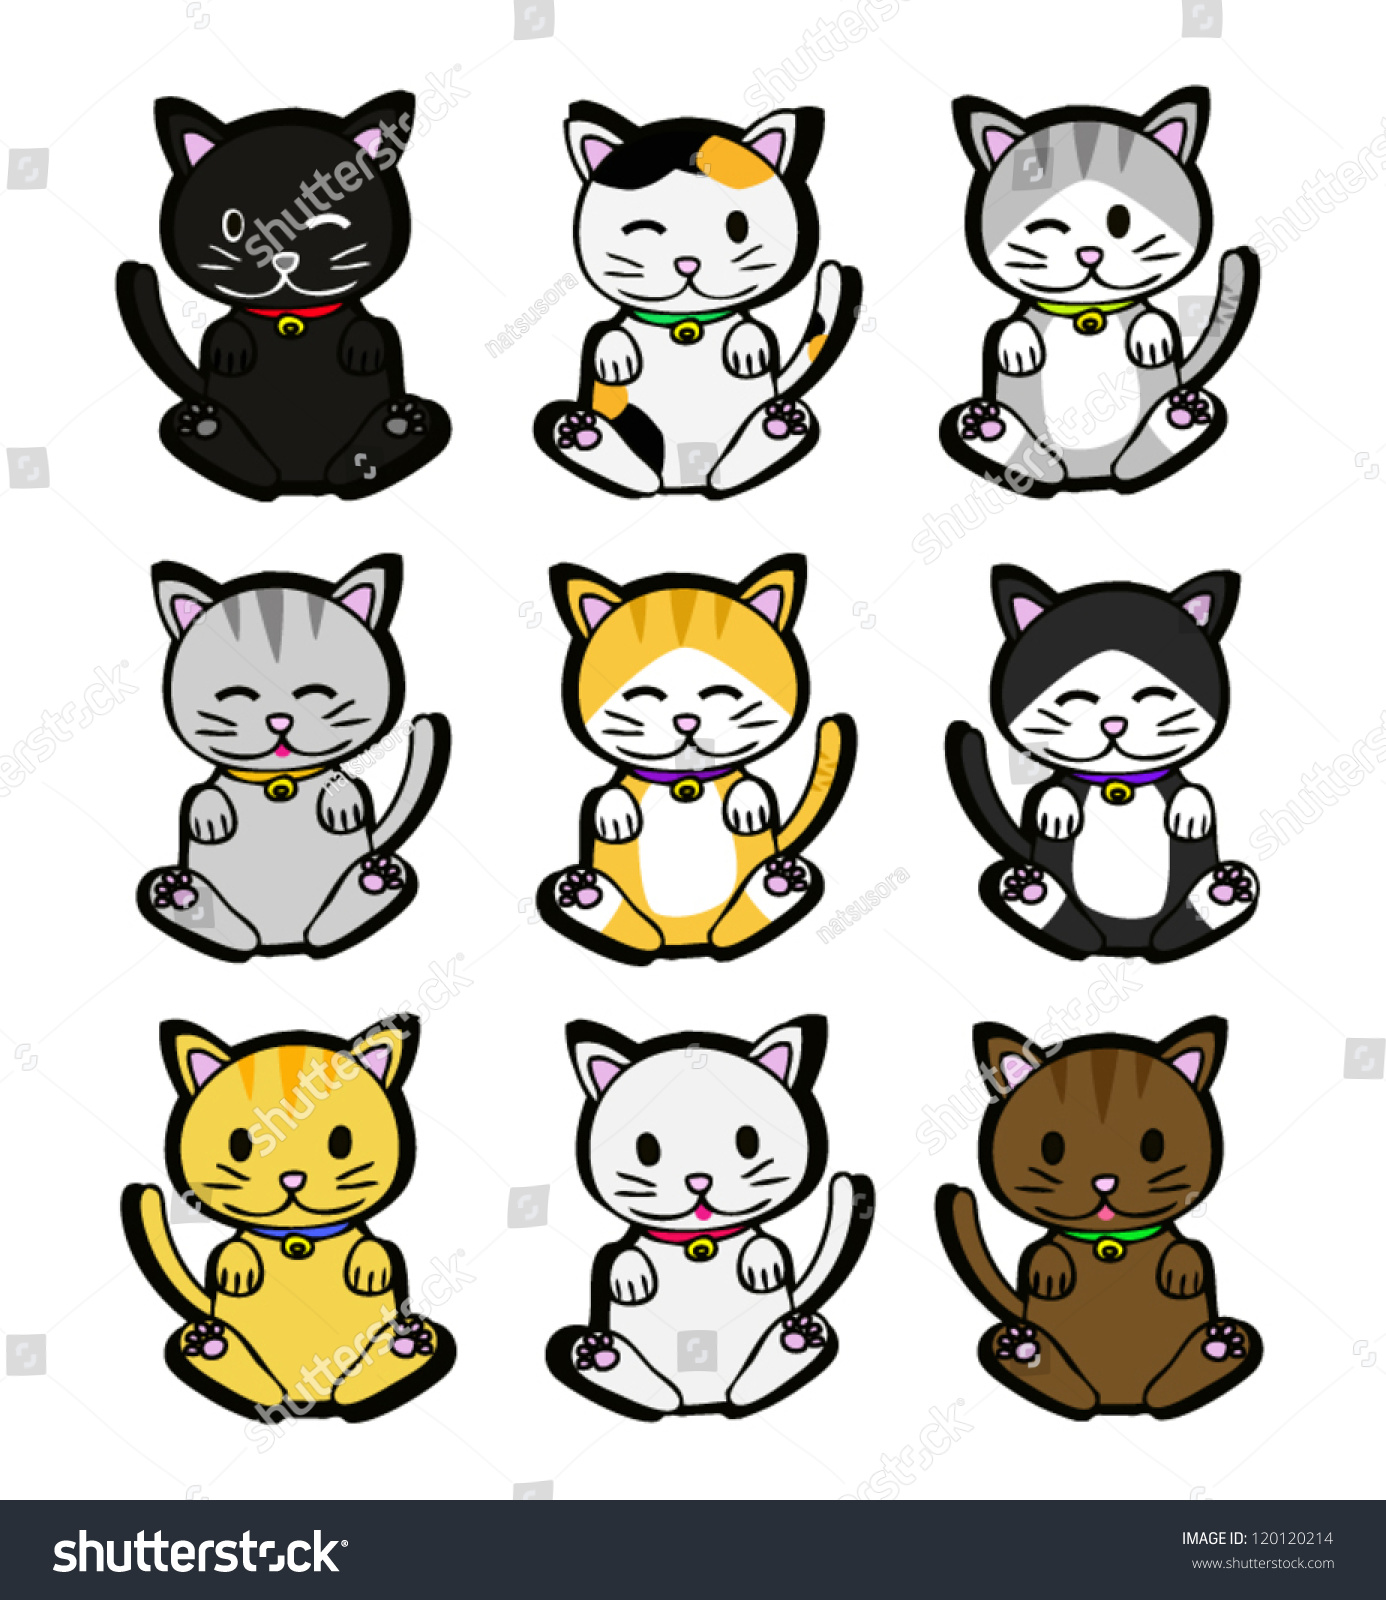 Cartoon Cat Stock Images | cartoon.ankaperla.com